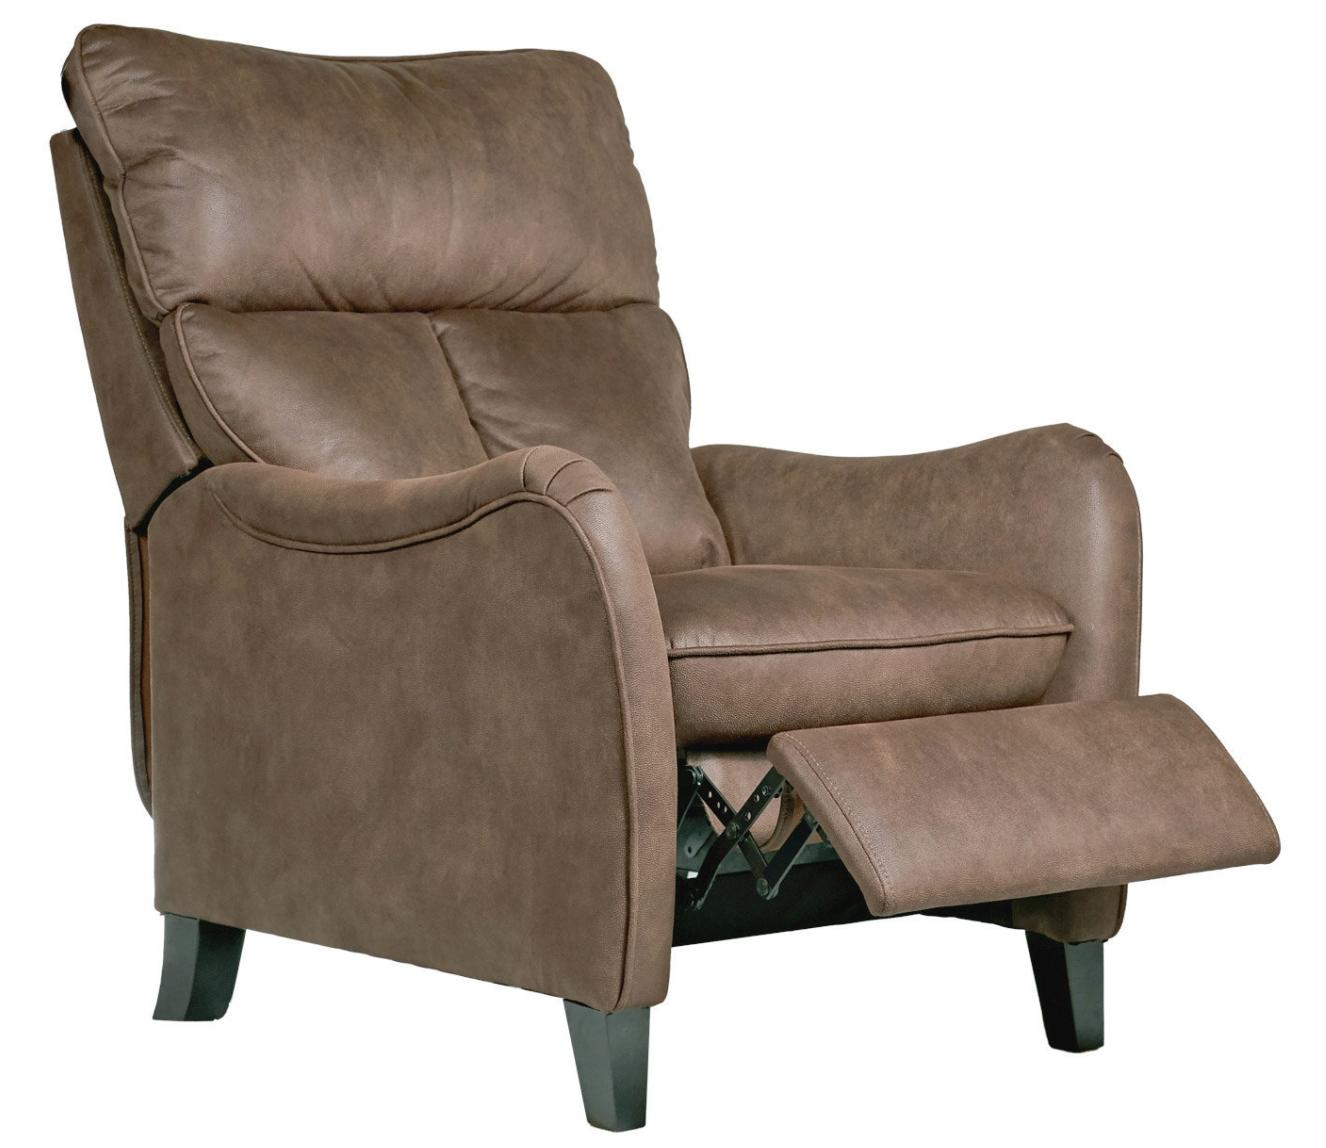 Fauteuil de relaxation manuel microfibre marron clair mika - Fauteuil de relaxation ...